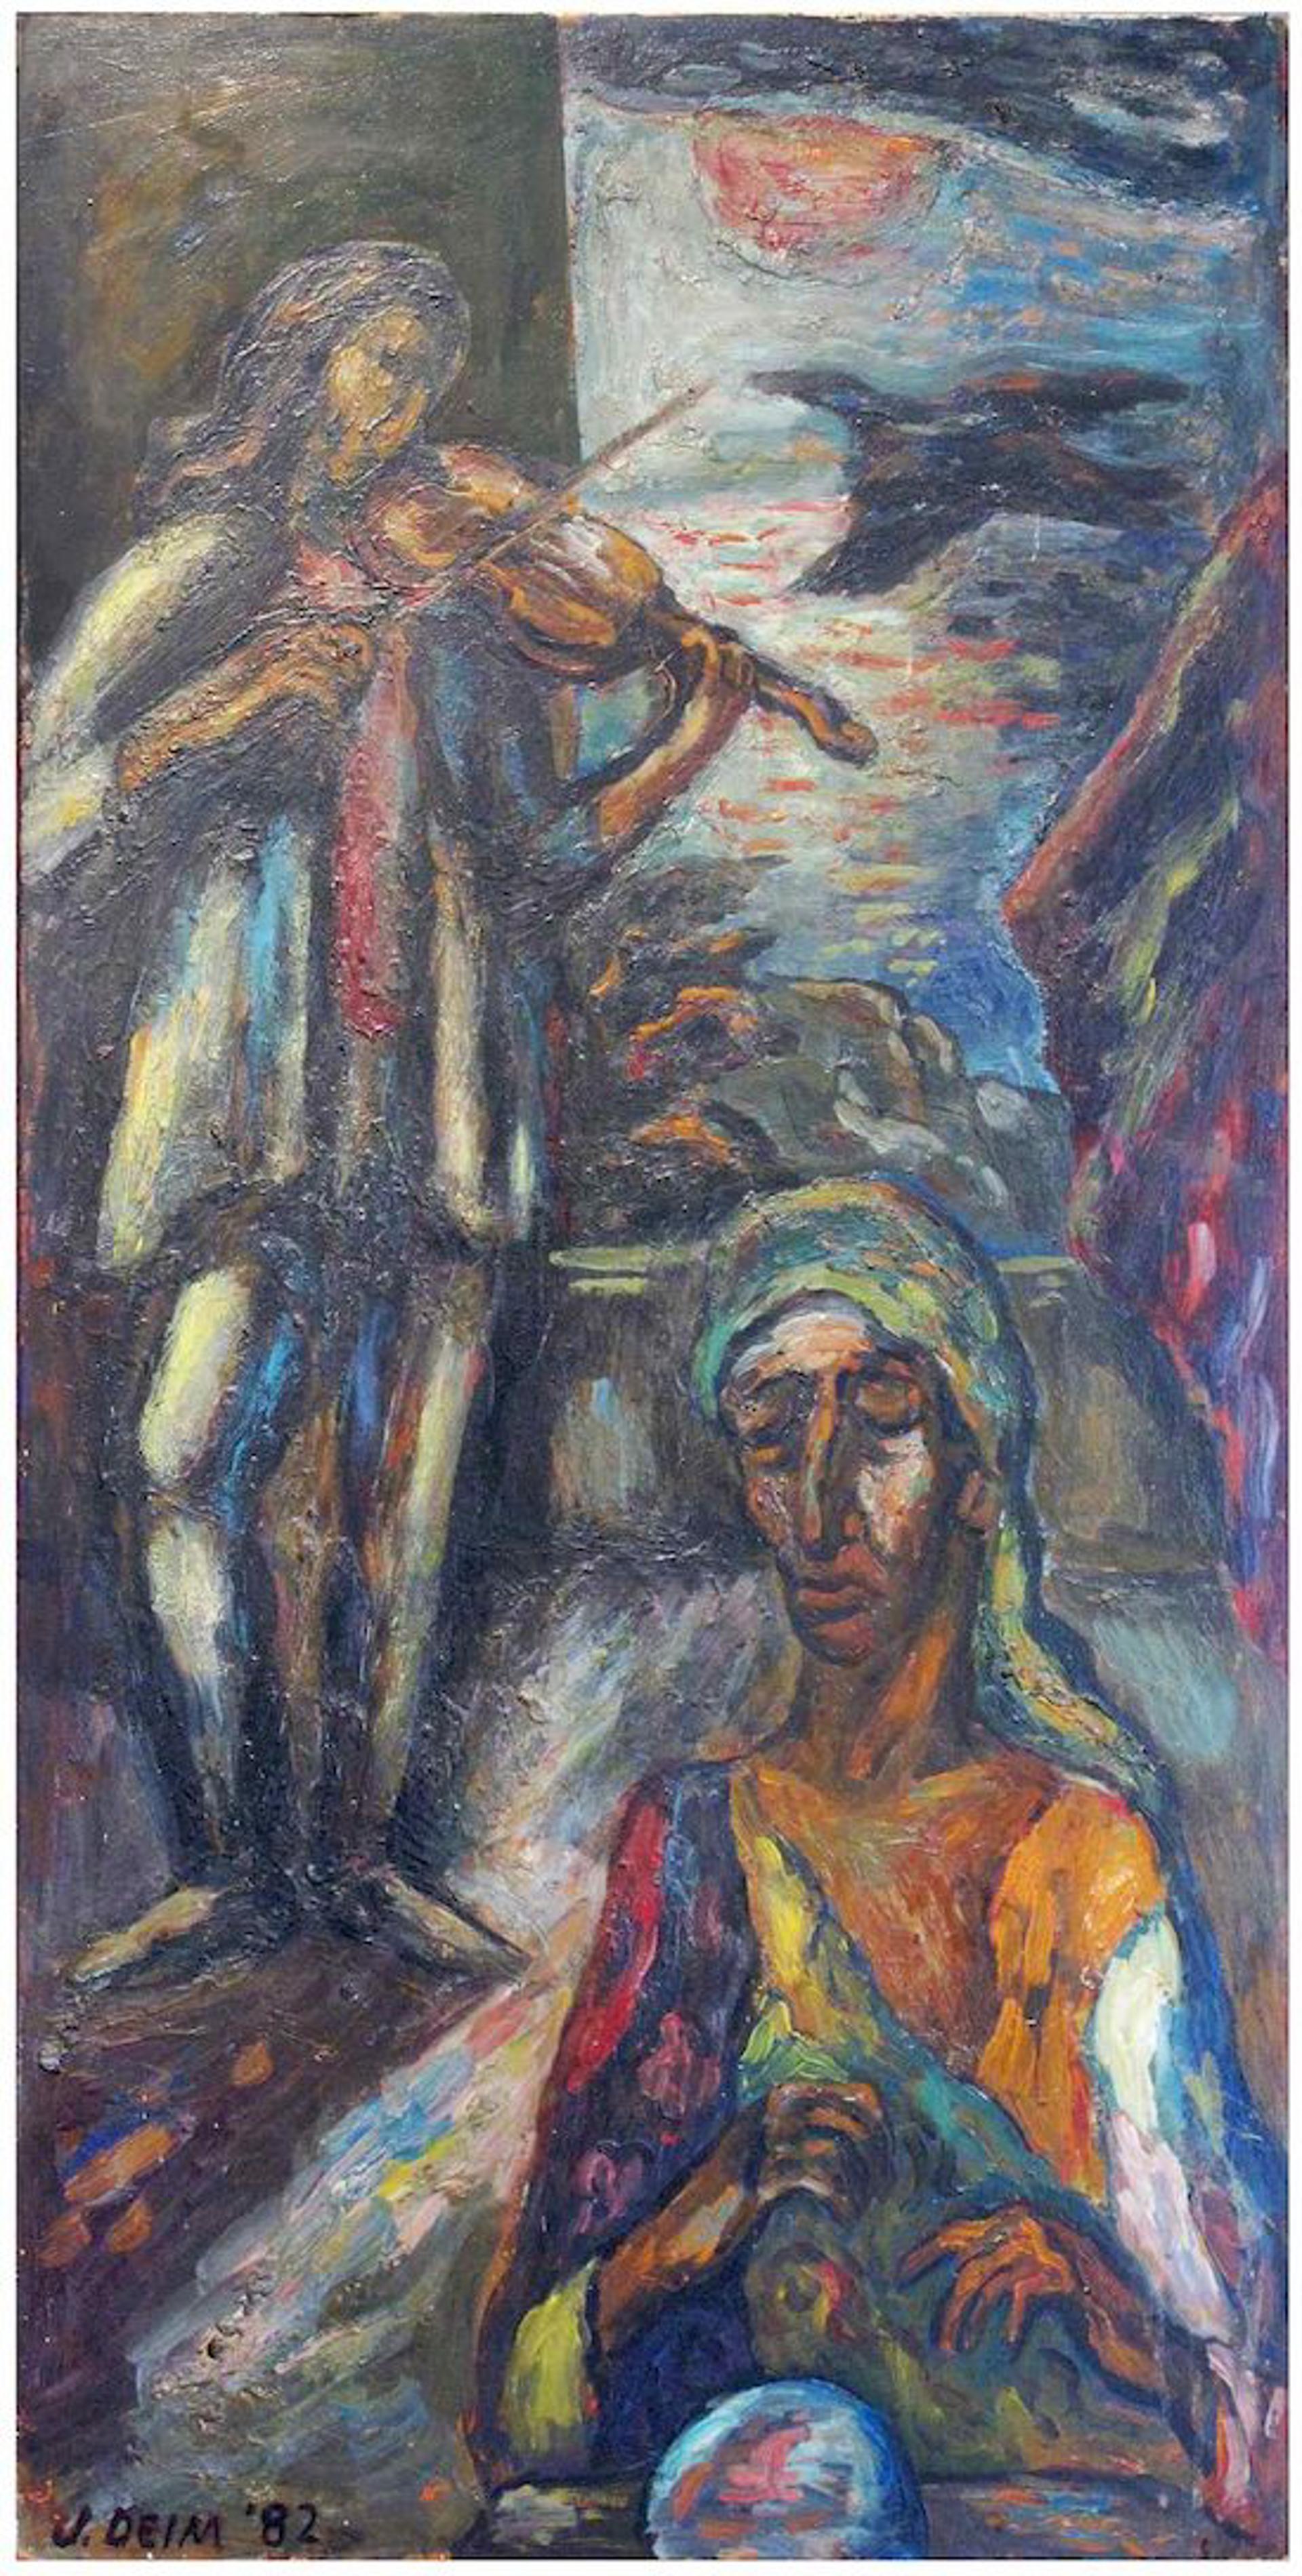 Evocation by Judith Deim